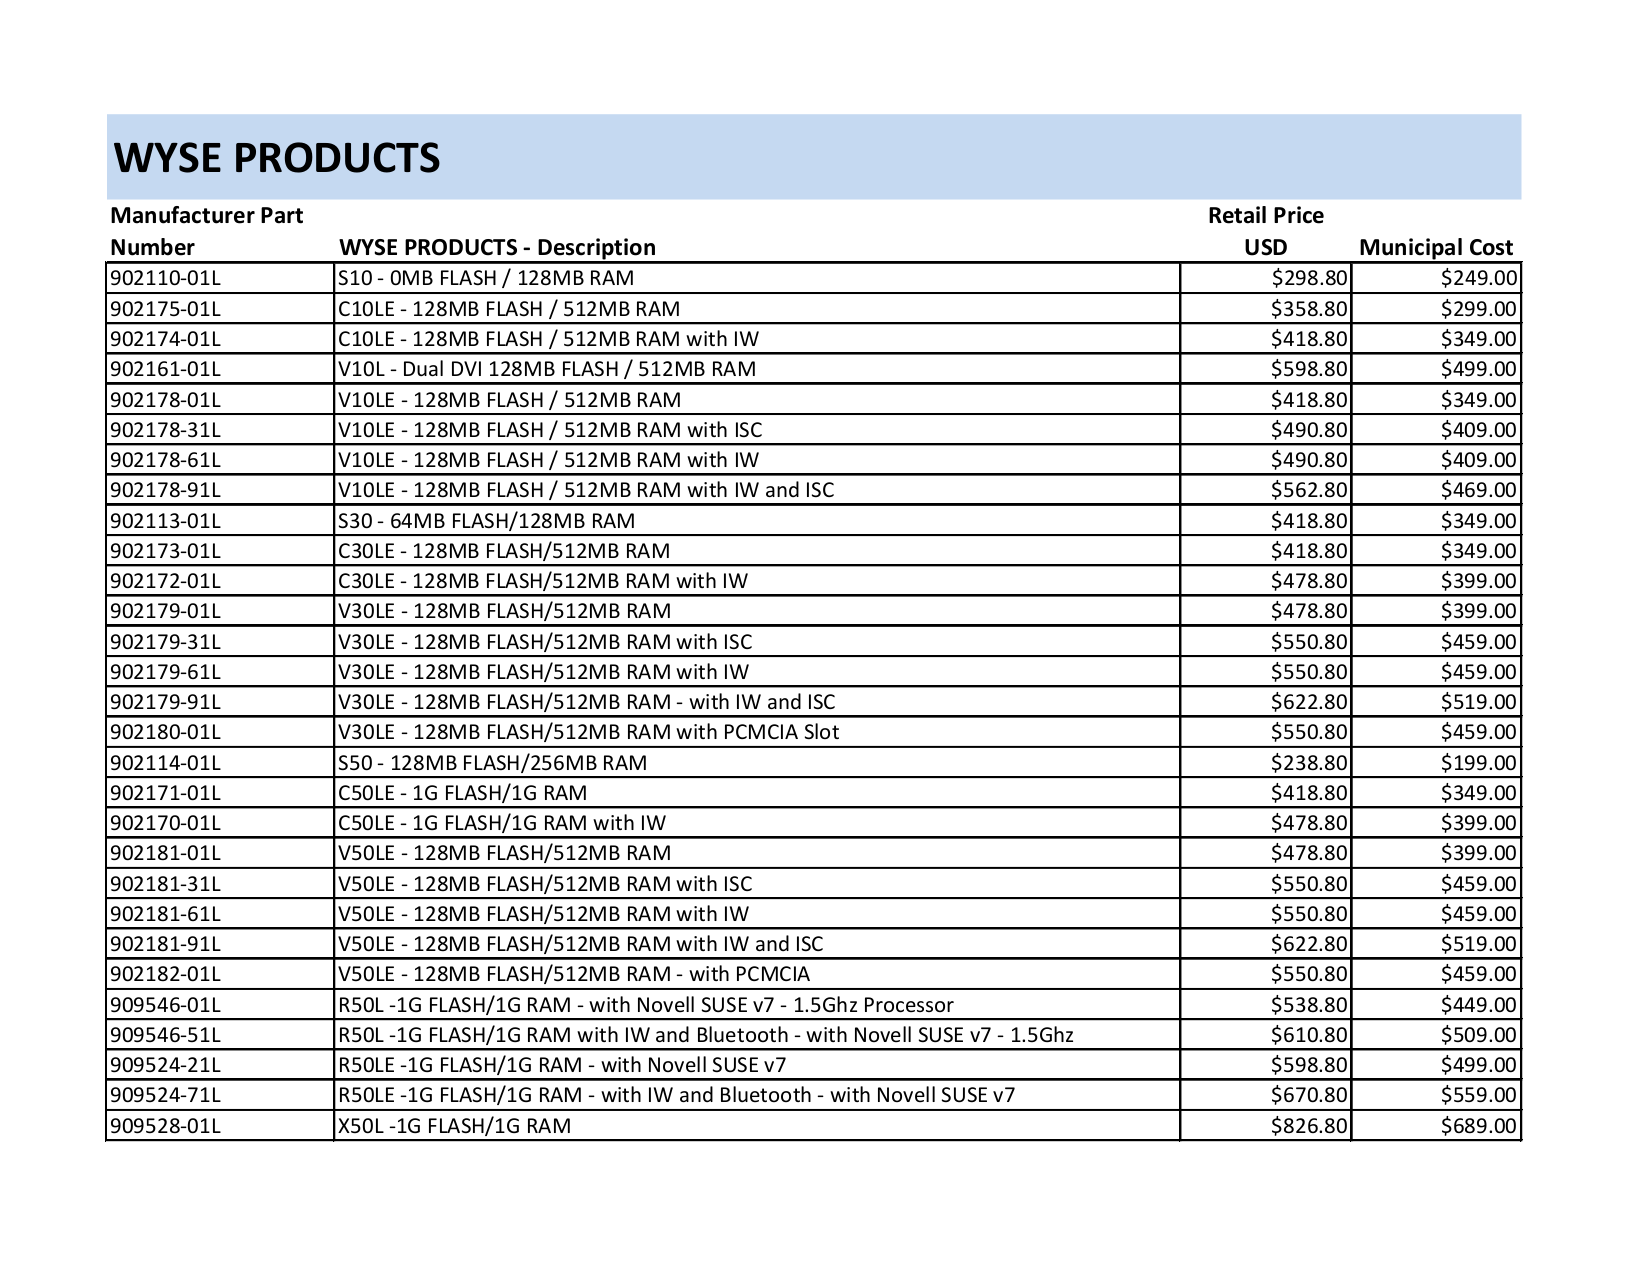 pdf for Wyse Desktop C50LE manual